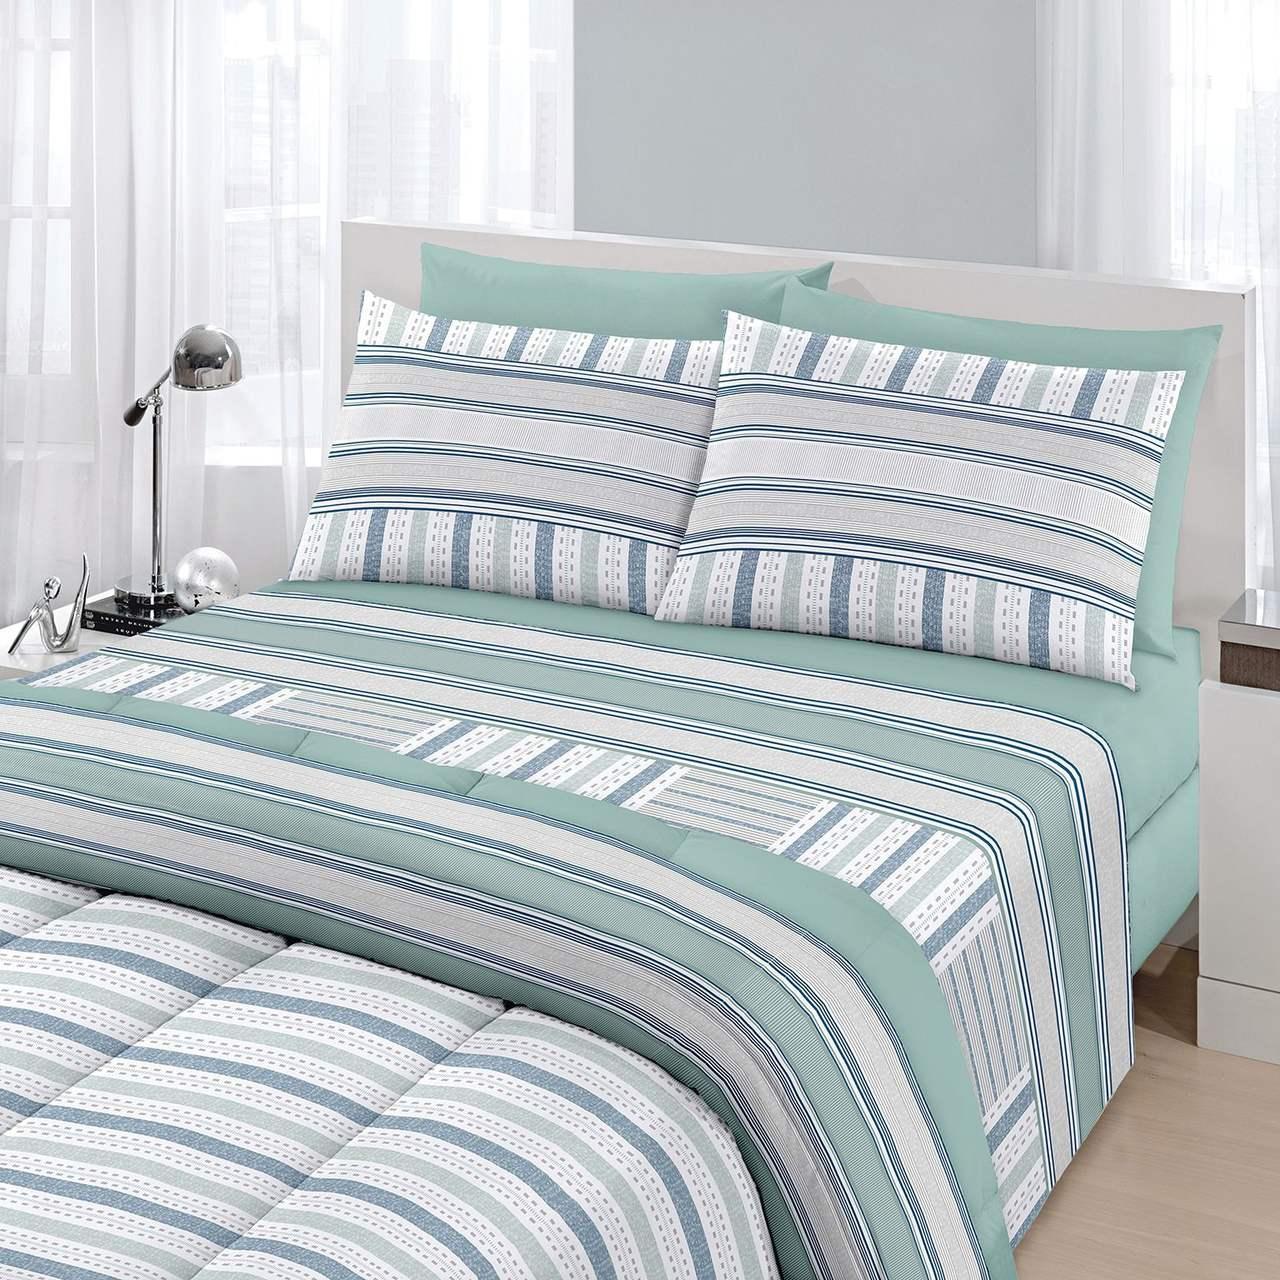 Jogo de cama casal Royal Boston 1 100% algodão estampado verde - Santista